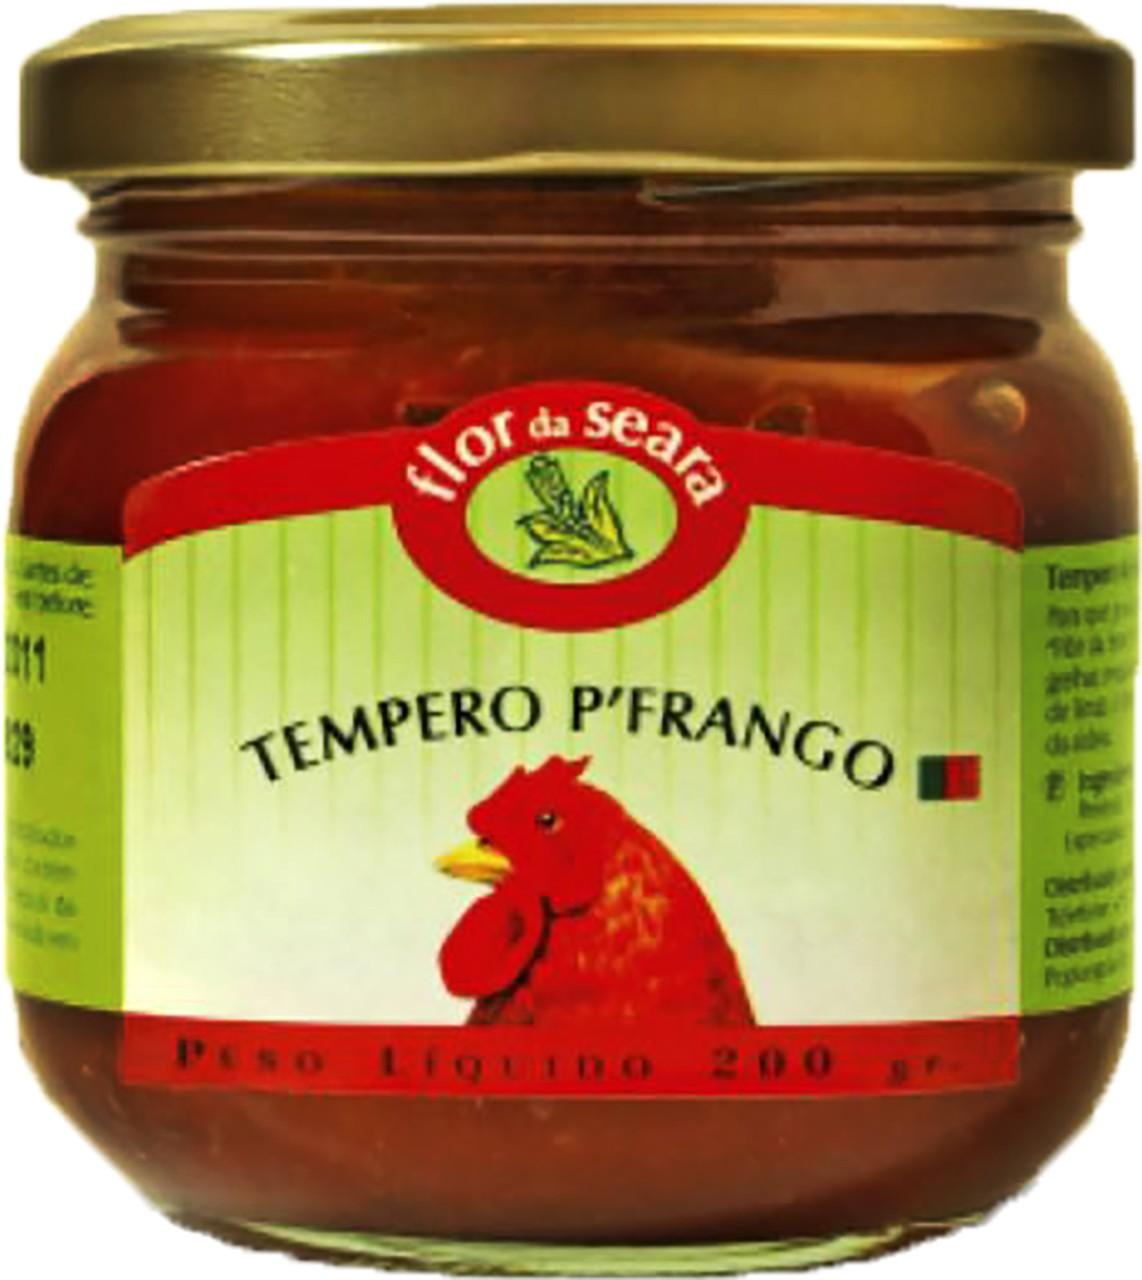 Hähnchengewürzpaste - Tempero para Frangos